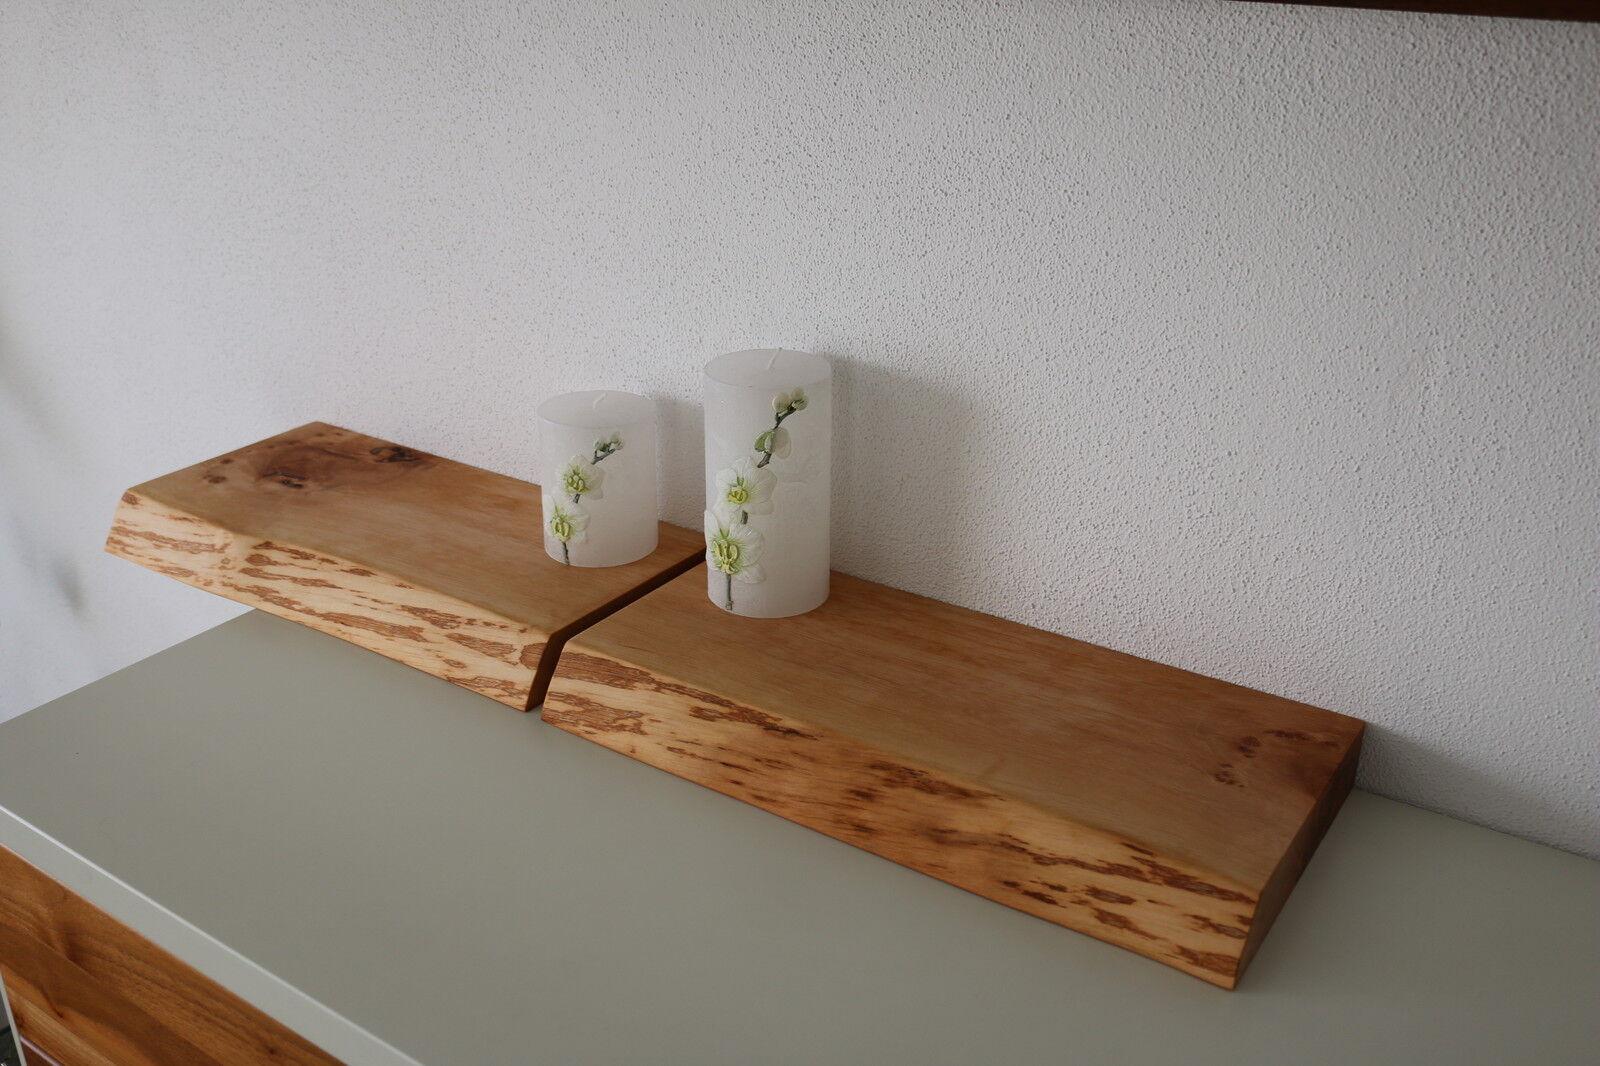 2x wandboard erle massiv holz board regal steckboard regalbrett baumkante neu eur 127 00. Black Bedroom Furniture Sets. Home Design Ideas